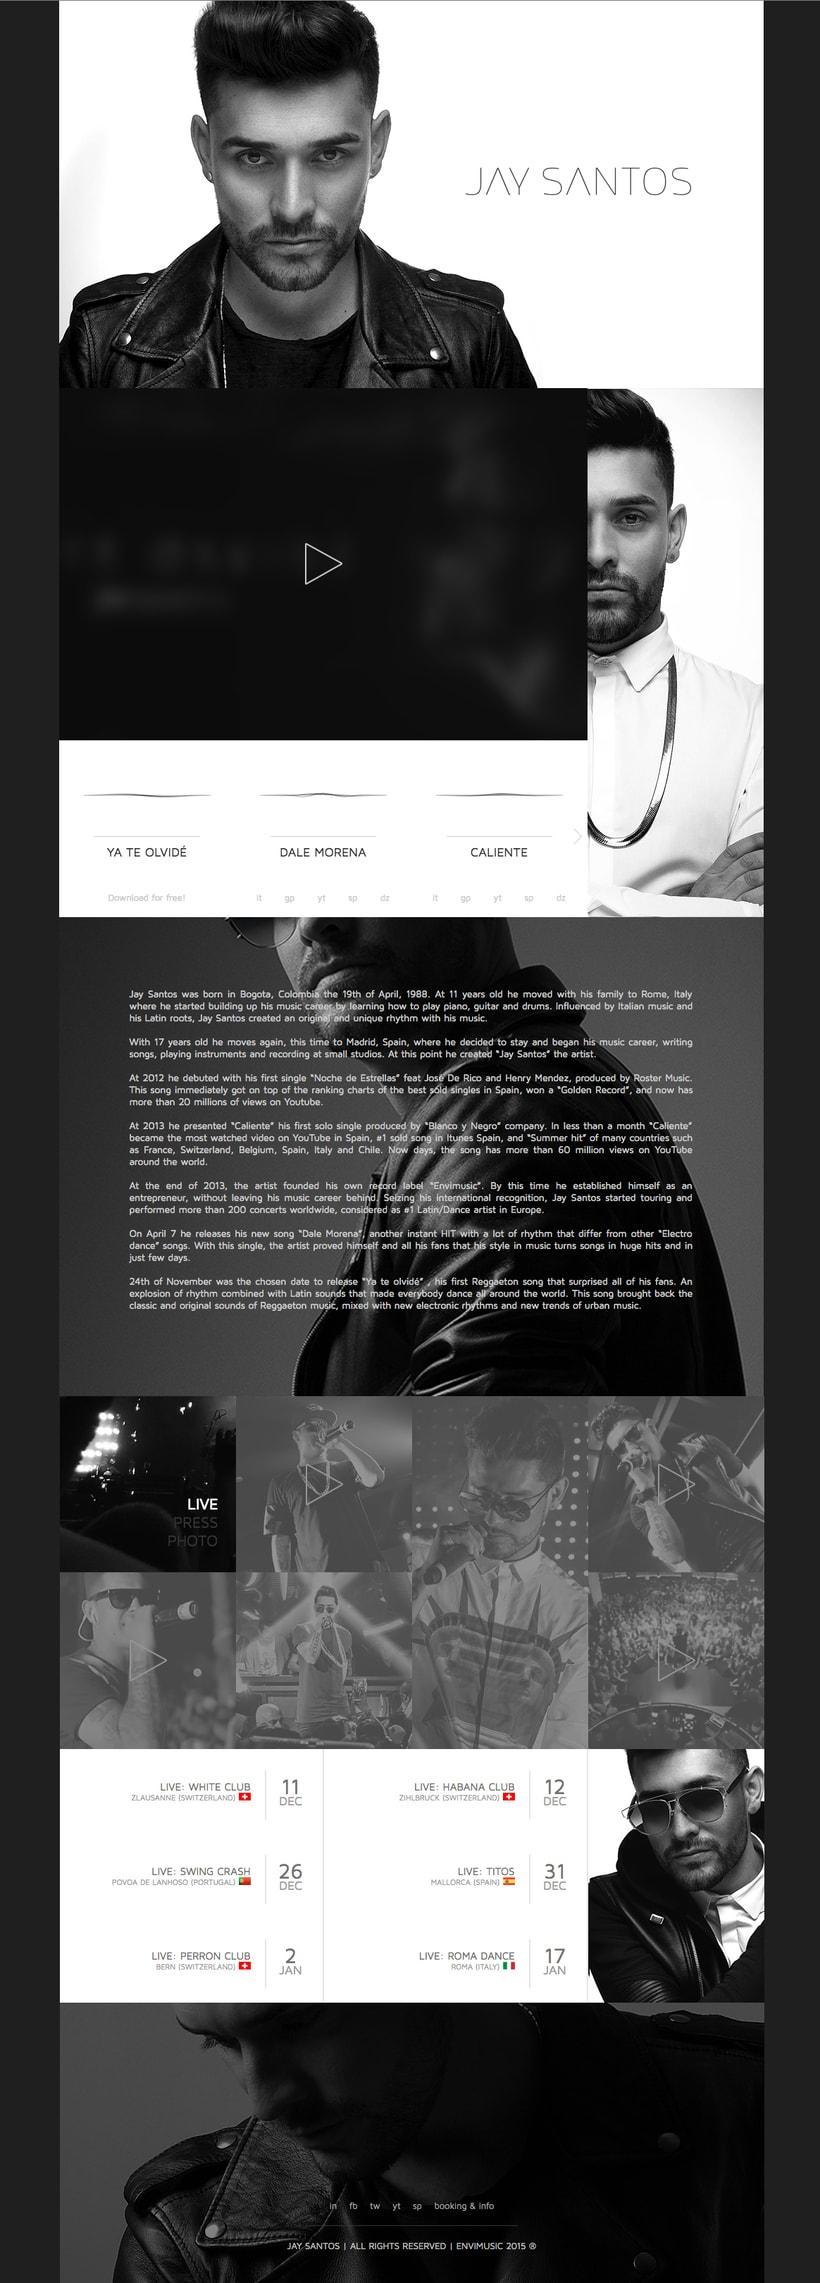 Jay Santos - Artist Web -1